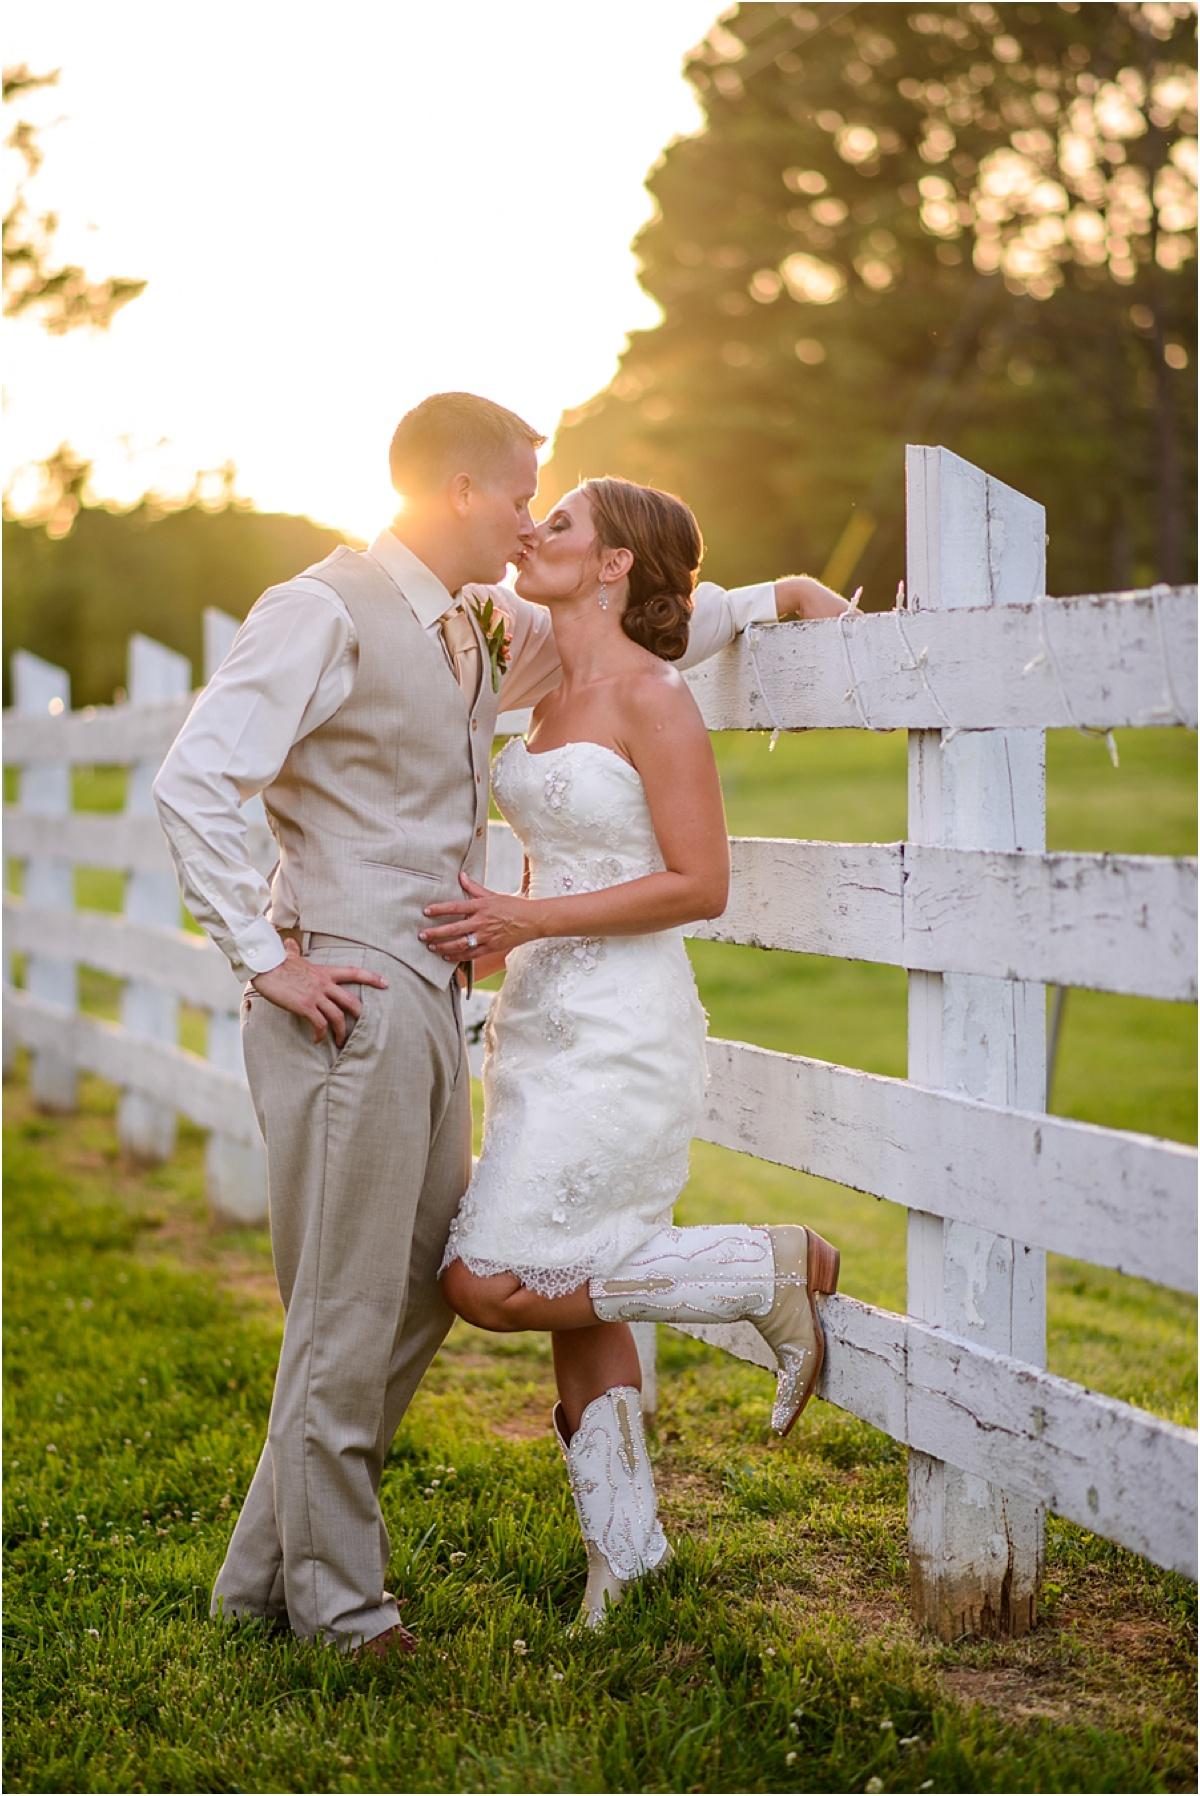 Greg Smit Photography Tennessee wedding photographer Salt Box Inn_0025